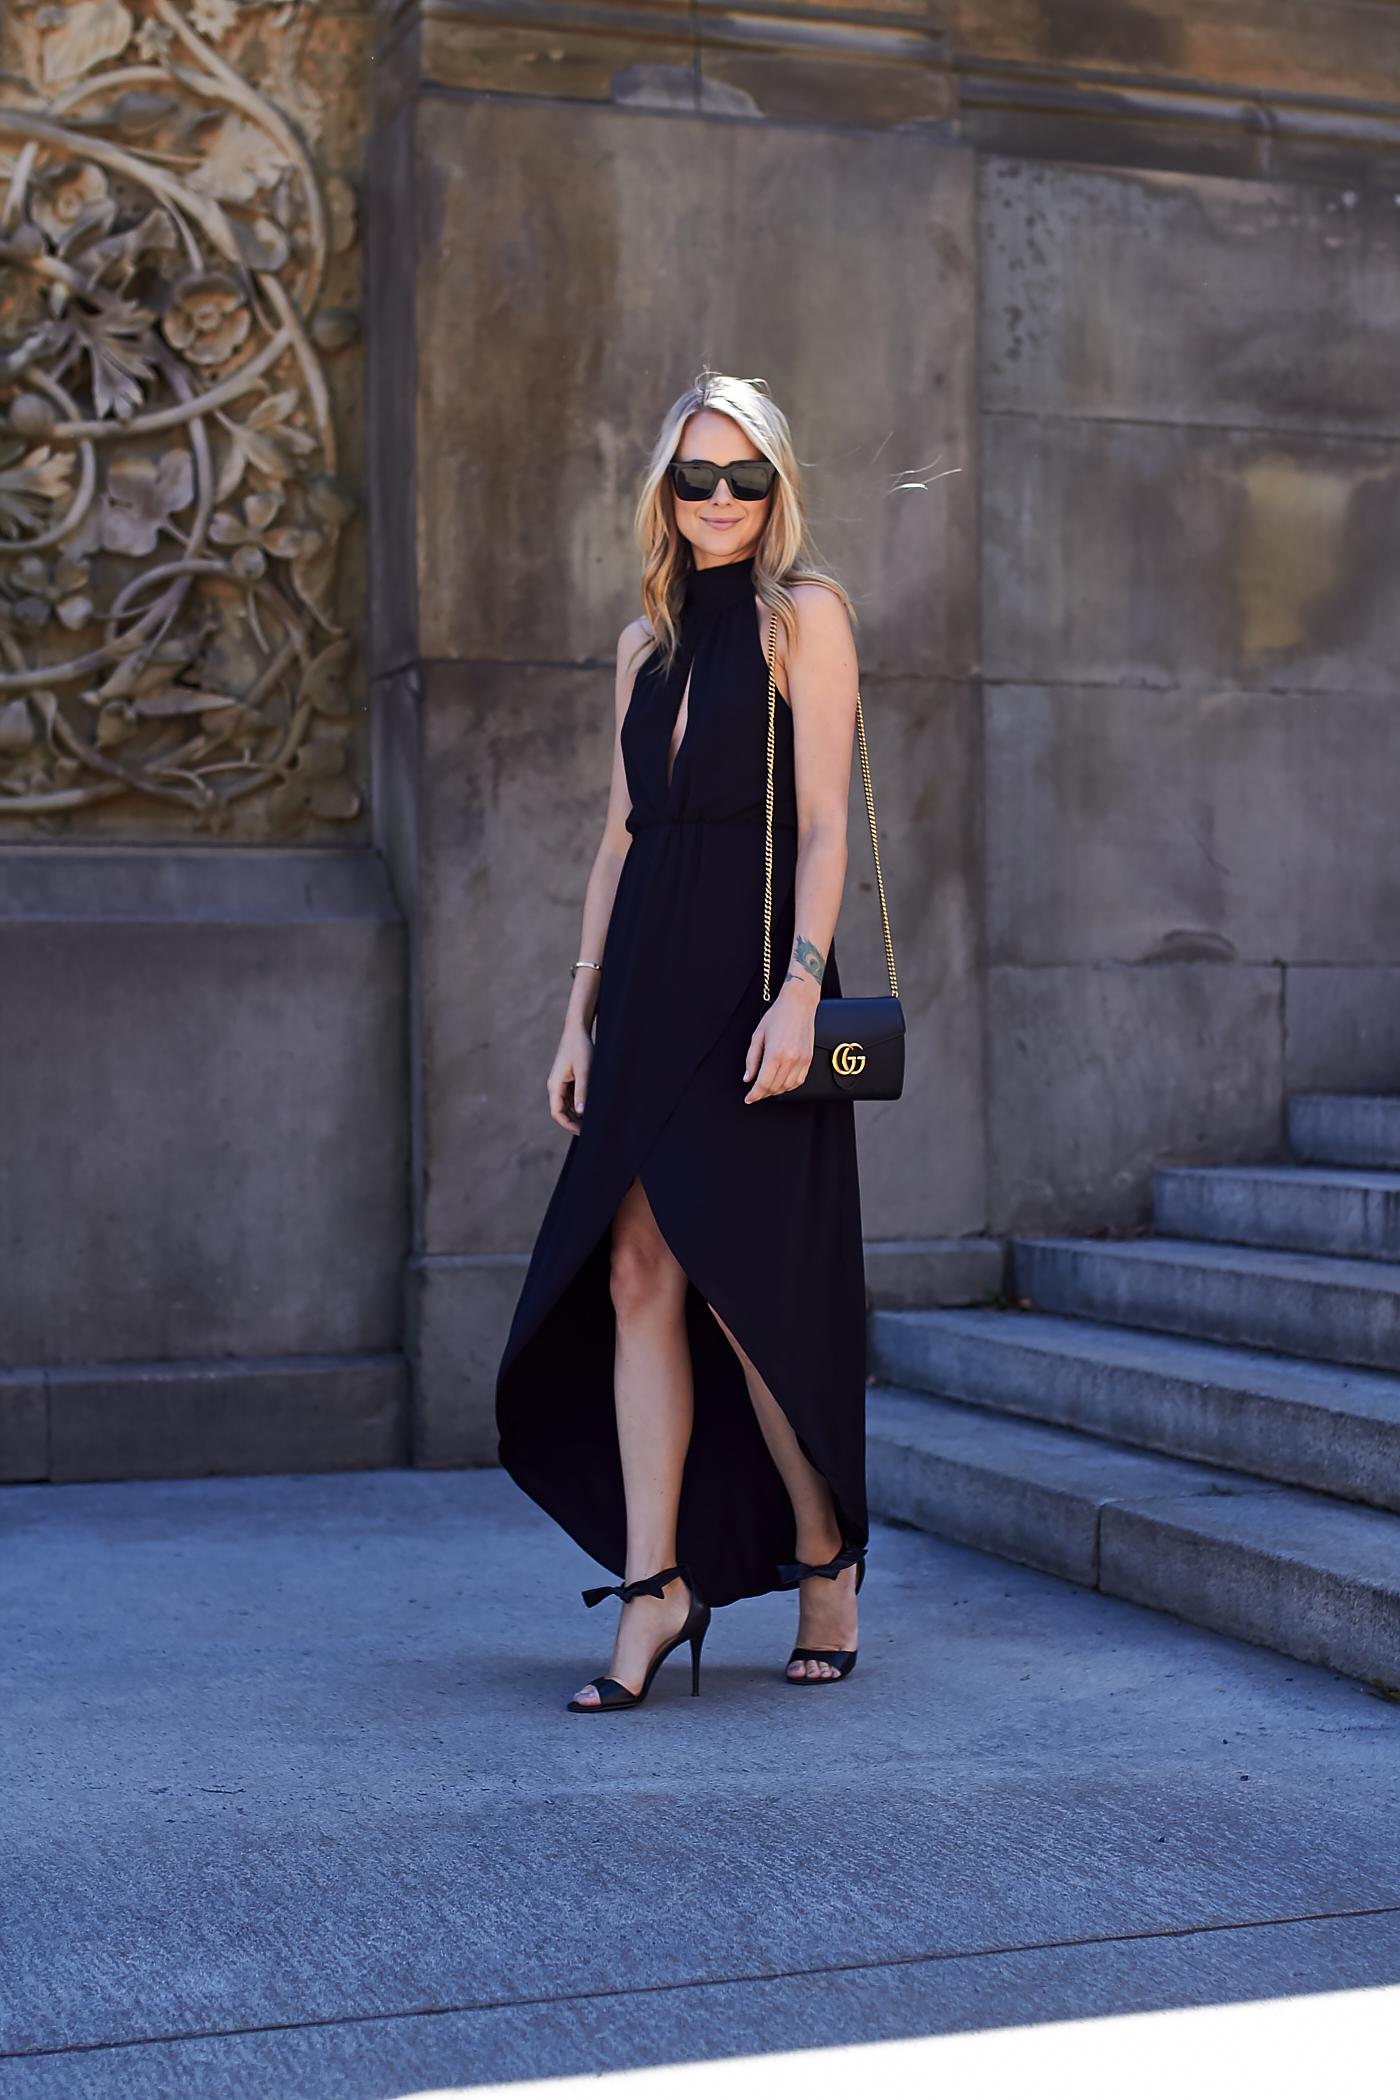 fahsion-jackson-black-high-low-hem-dress-gucci-marmont-handbag-black-bow-heels